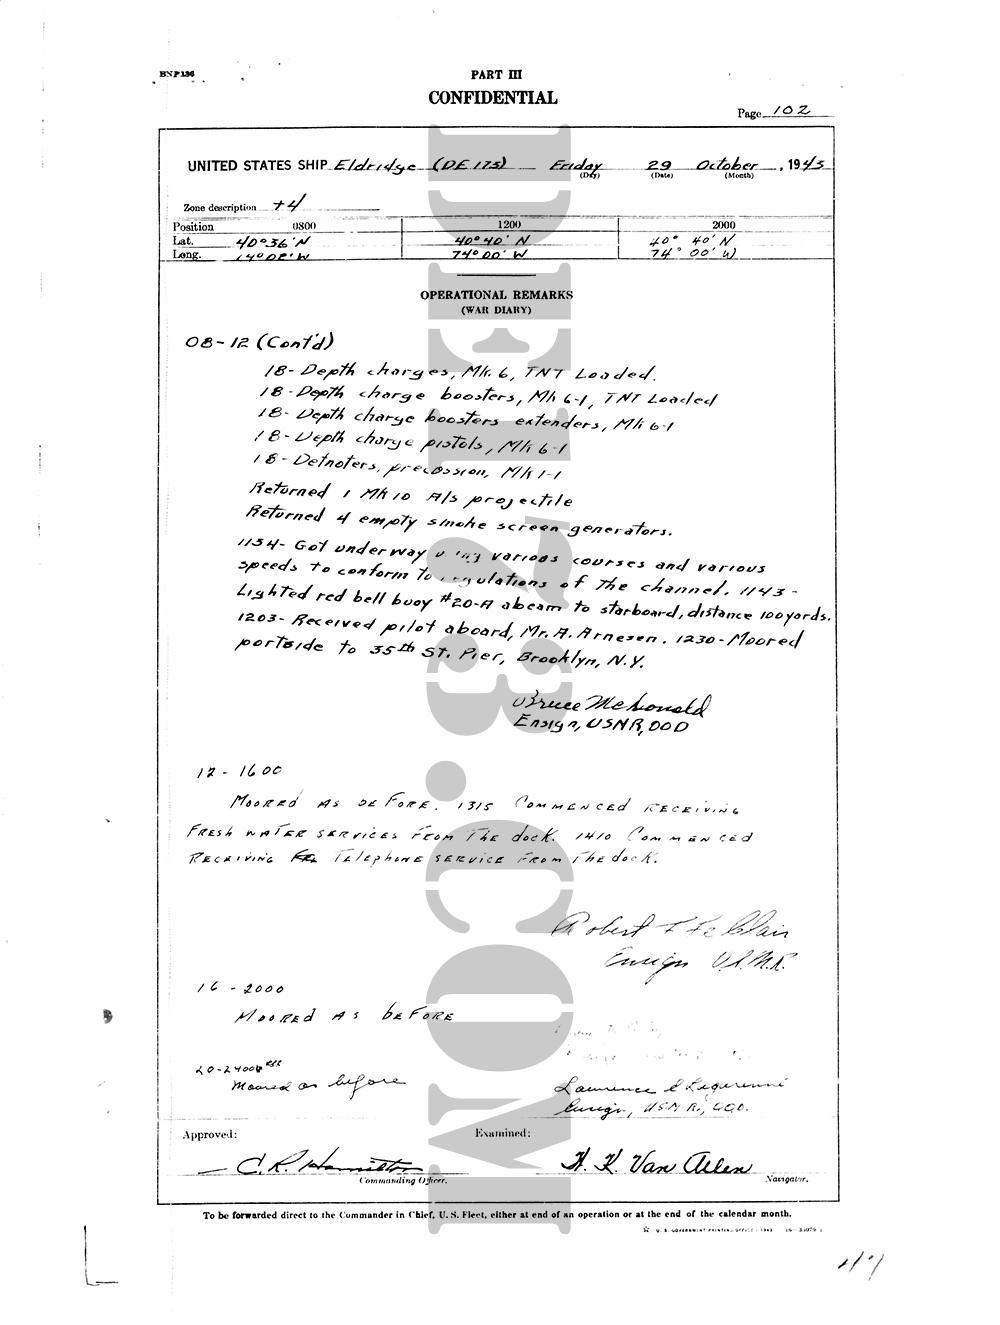 USS Eldridge Microfilm Page 102 / October 29th, 1943